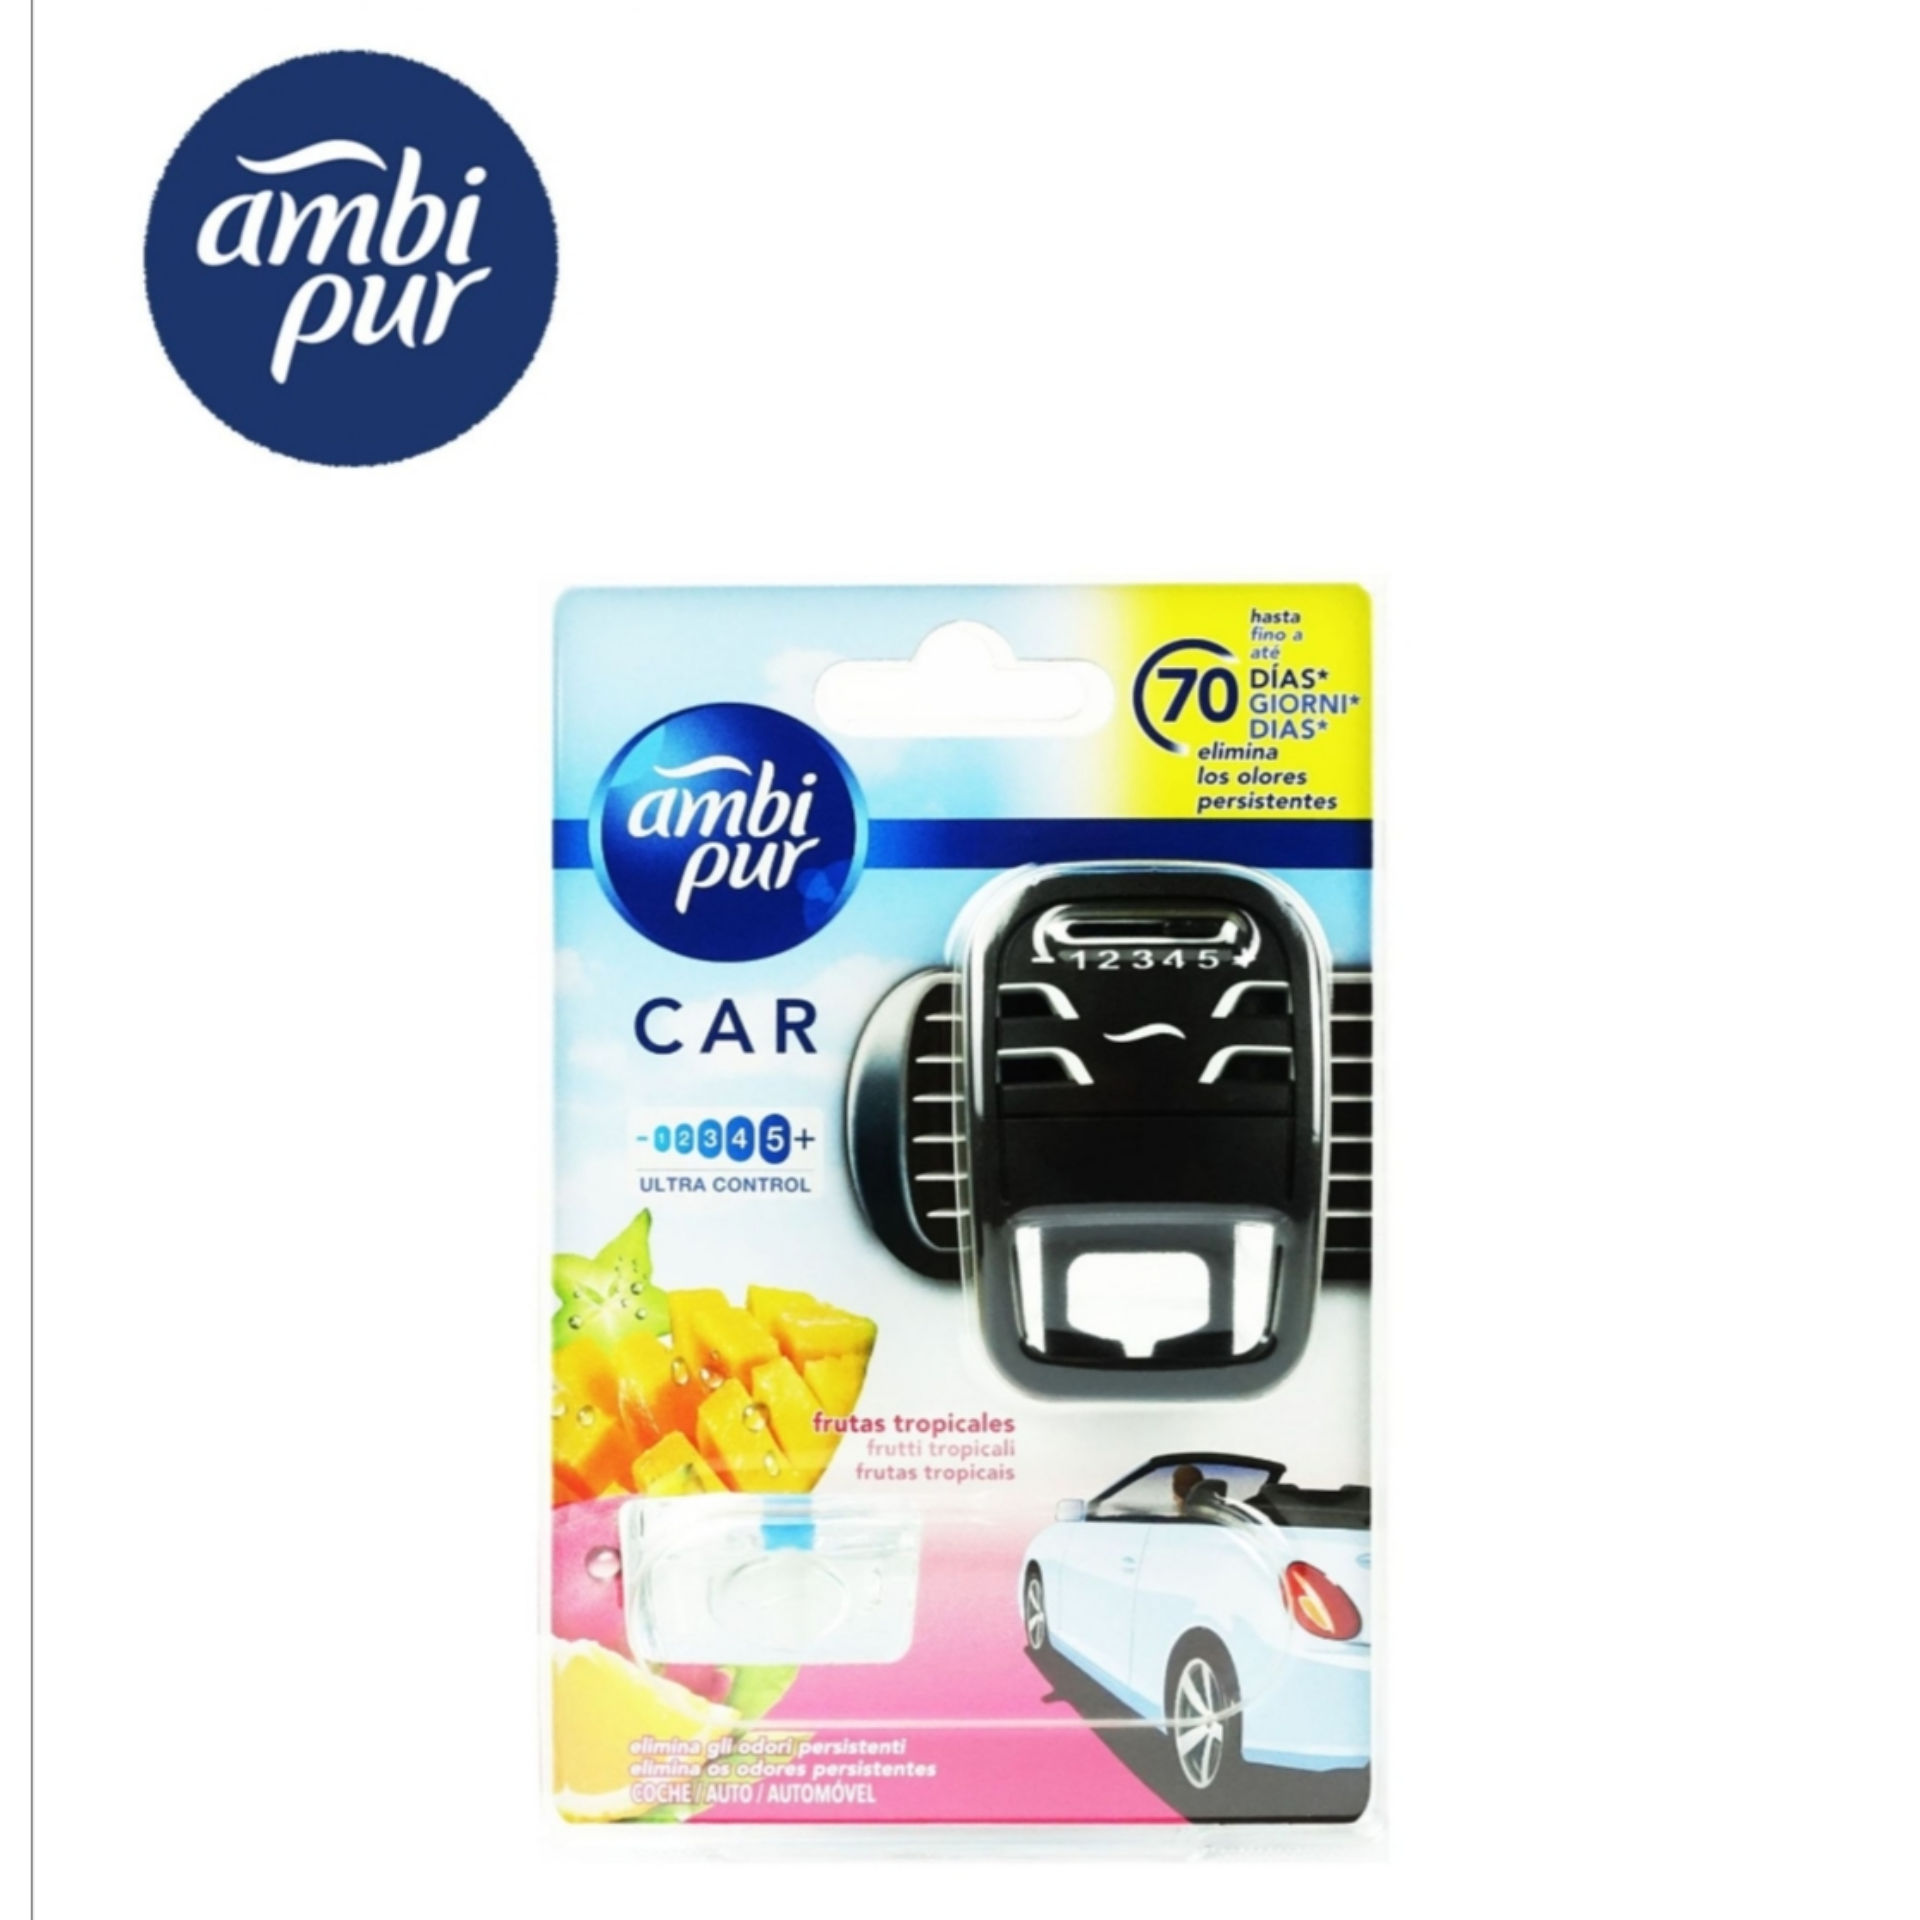 AMBIPUR CAR FRIUTY-TROPICALAmbipur